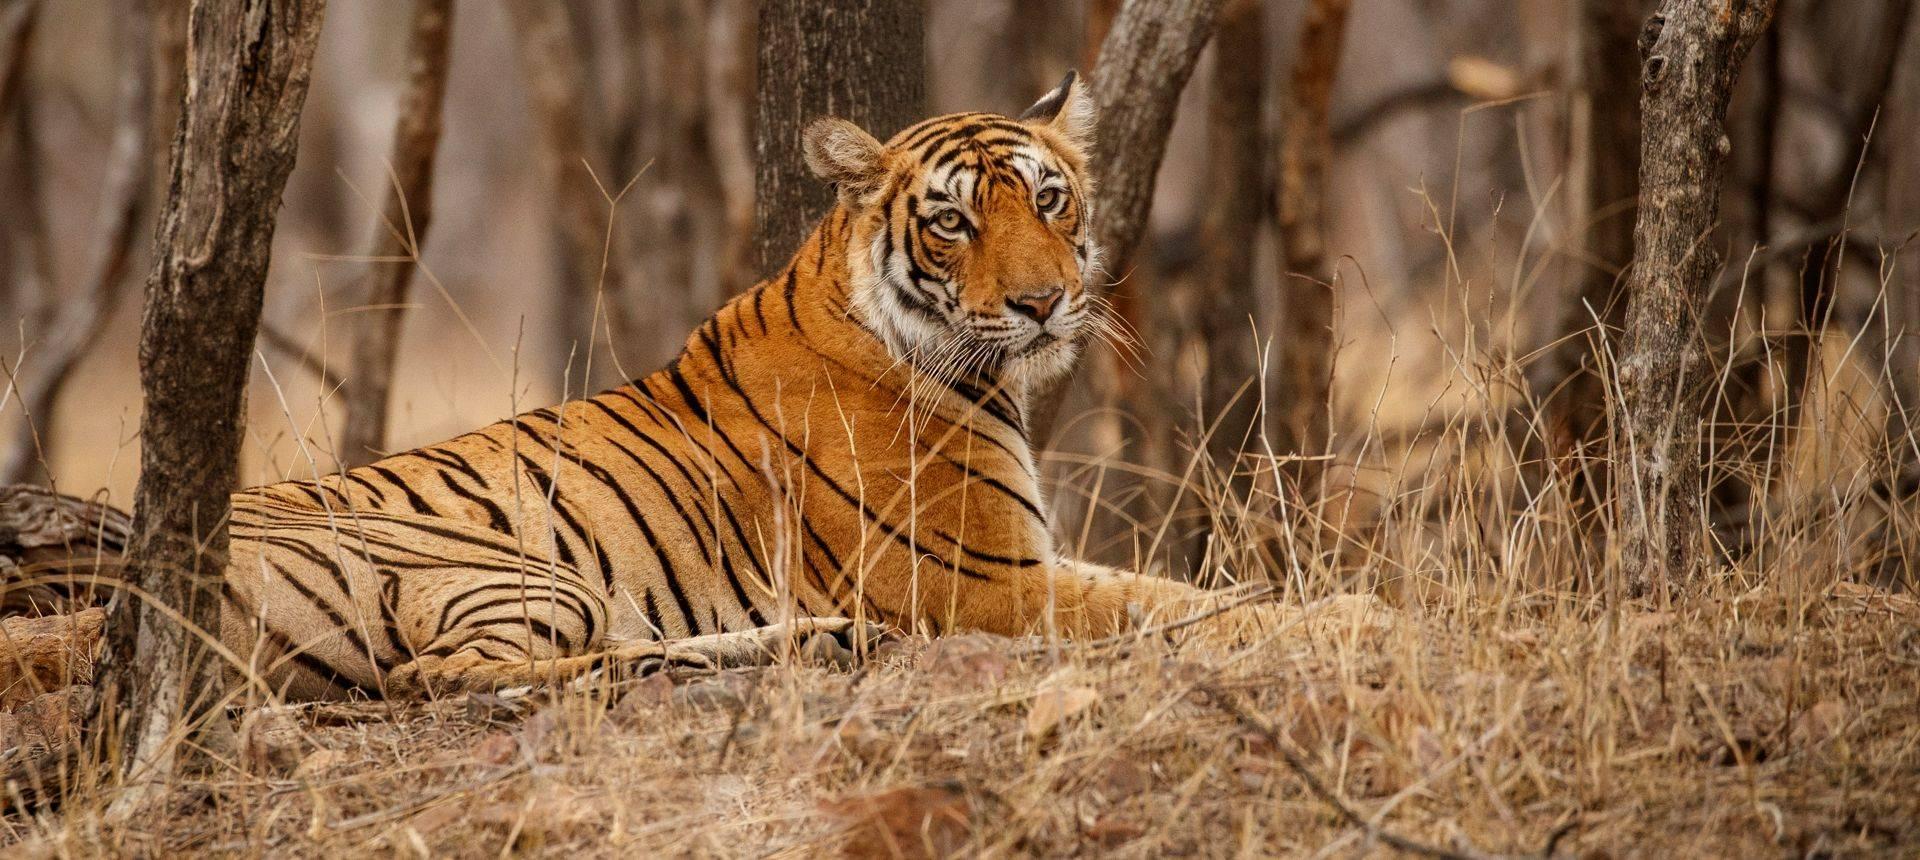 Bengal Tiger, India Shutterstock 650108779